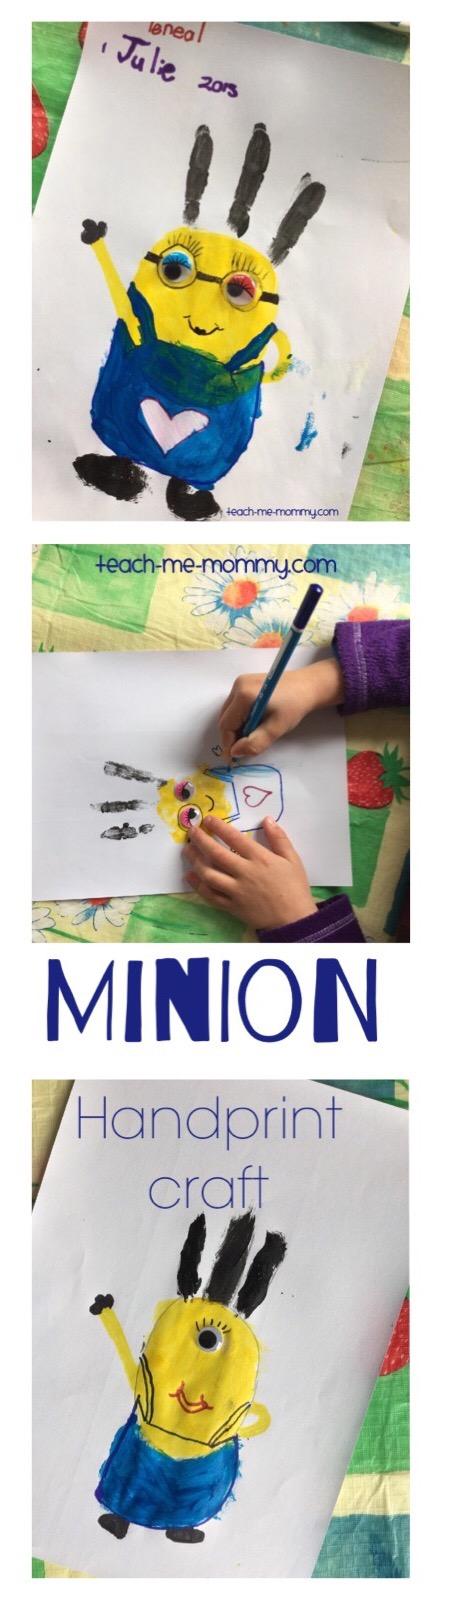 minion handprint craft